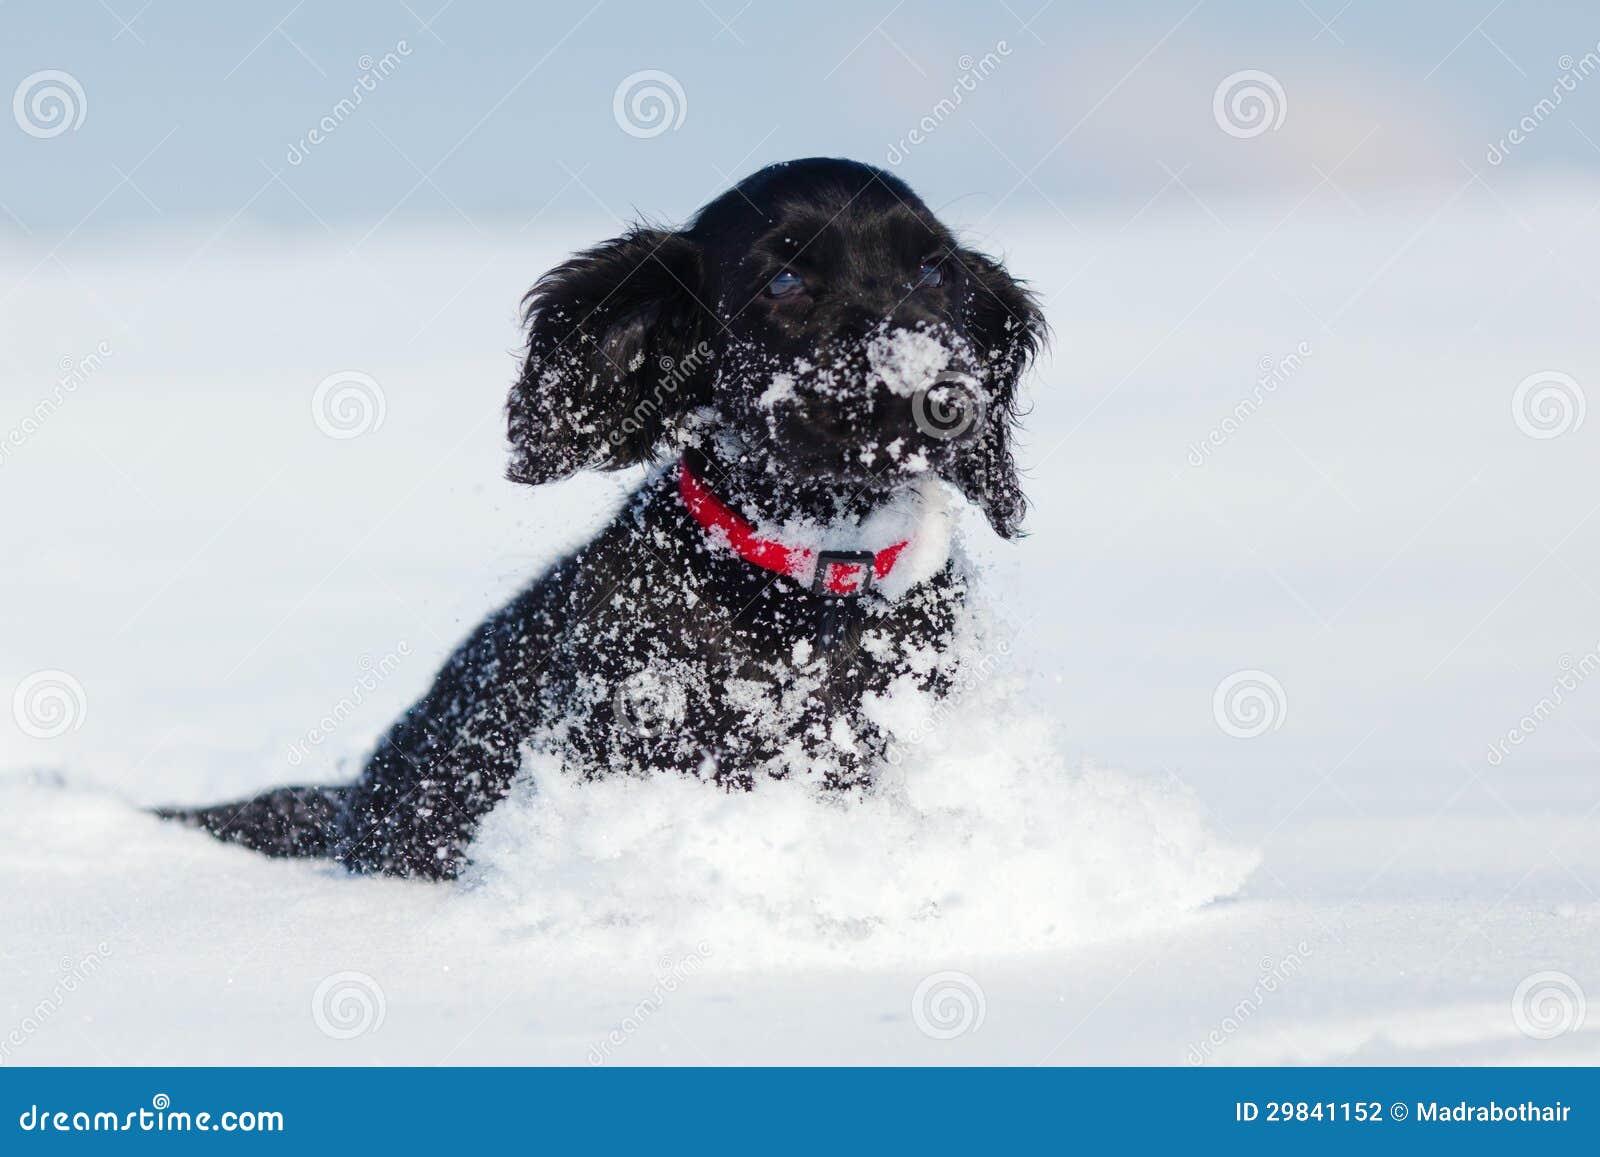 Cocker Spaniel Puppy Runs Through The Snow Stock Photo Image Of Walking Snow 29841152